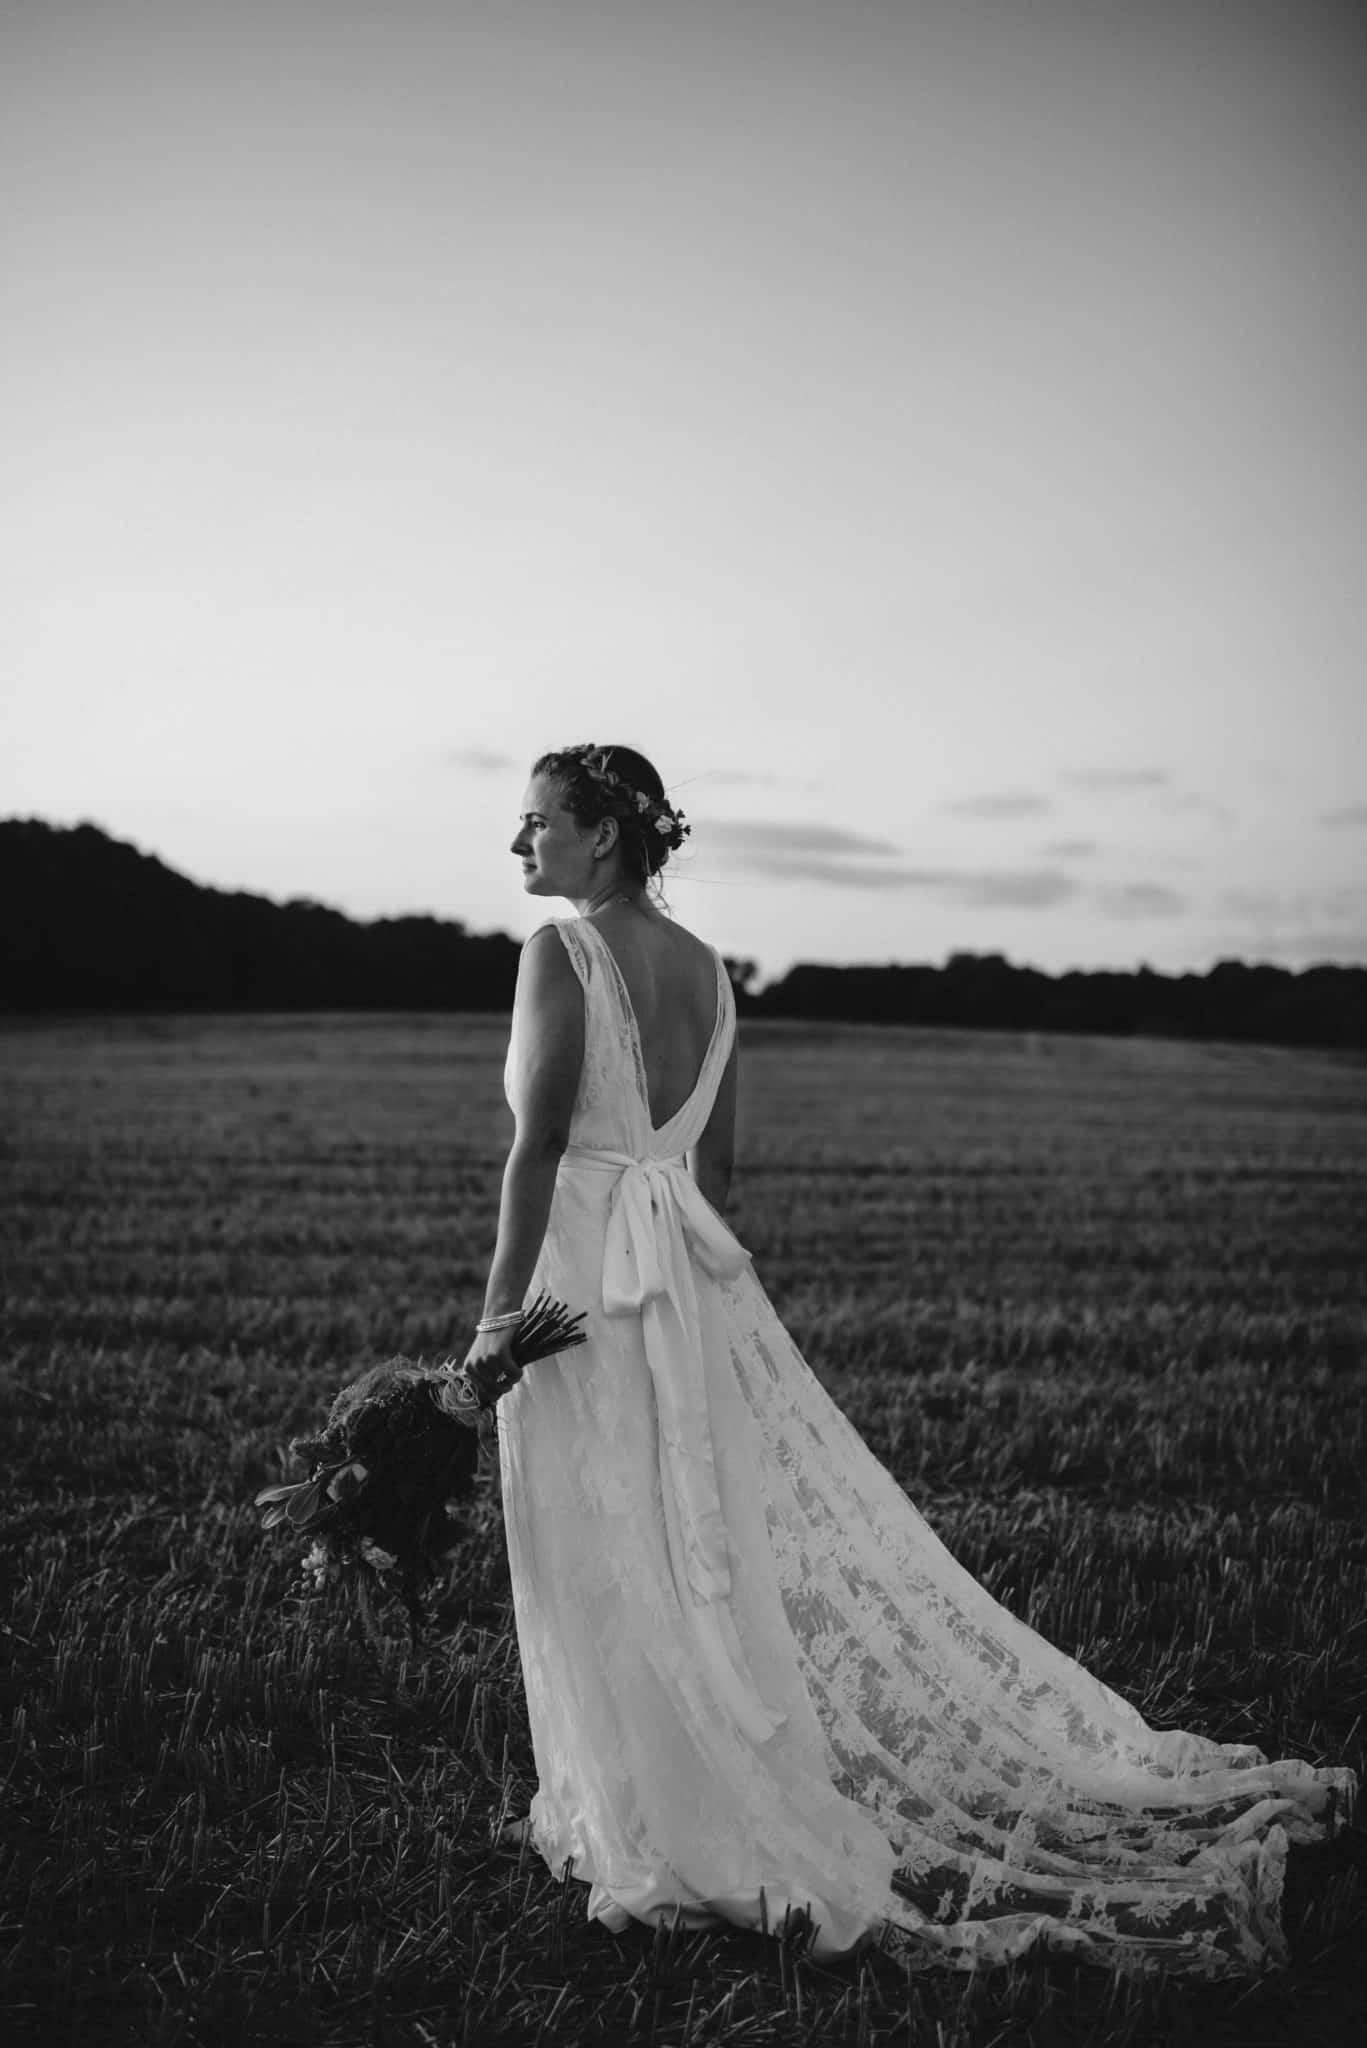 back of boho bride walking through field